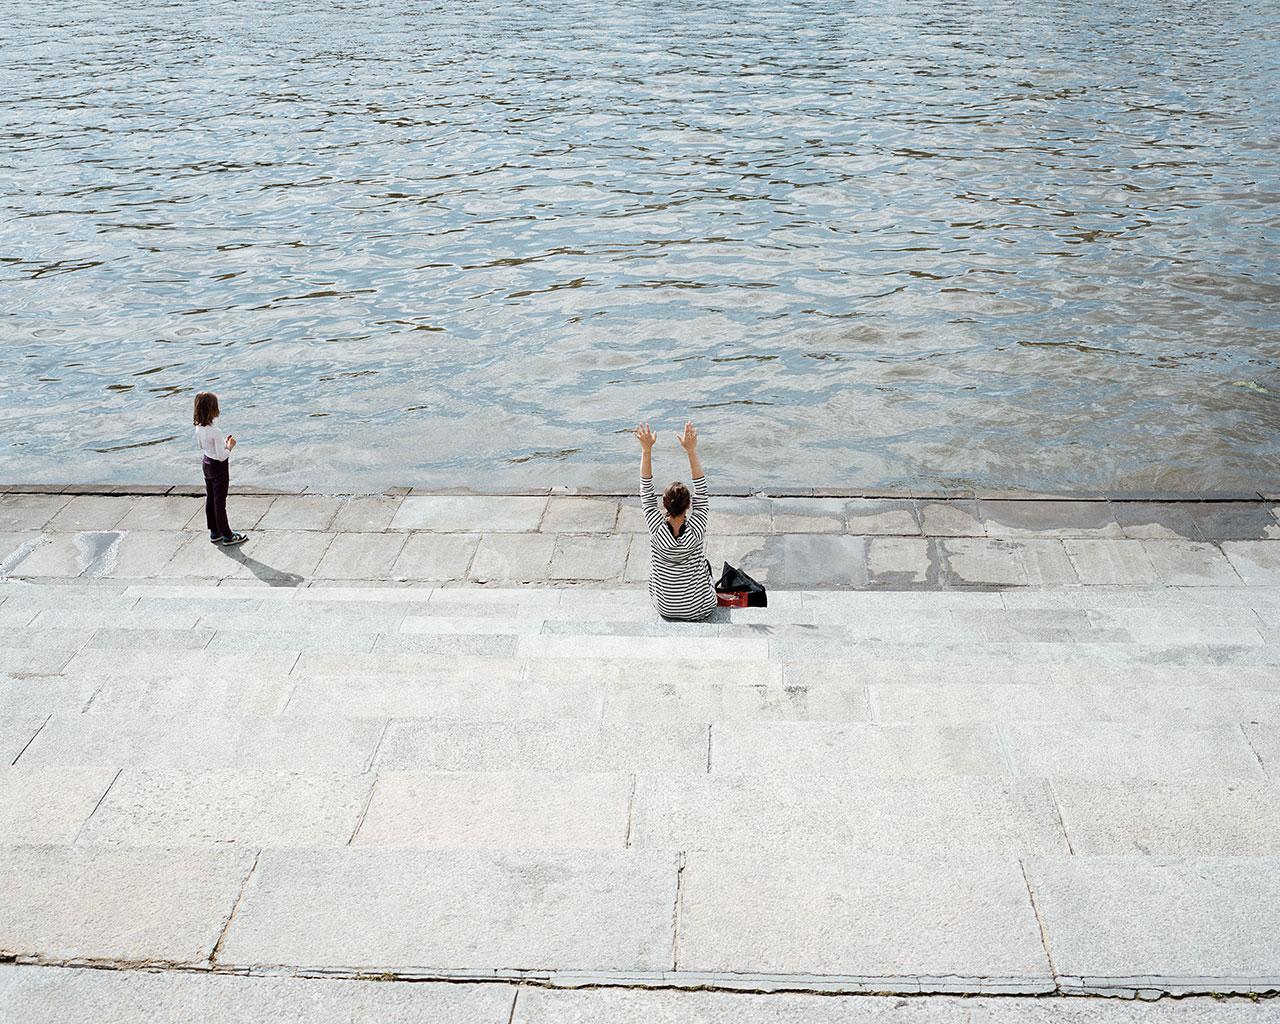 5. Untitled (Moskau), 2014